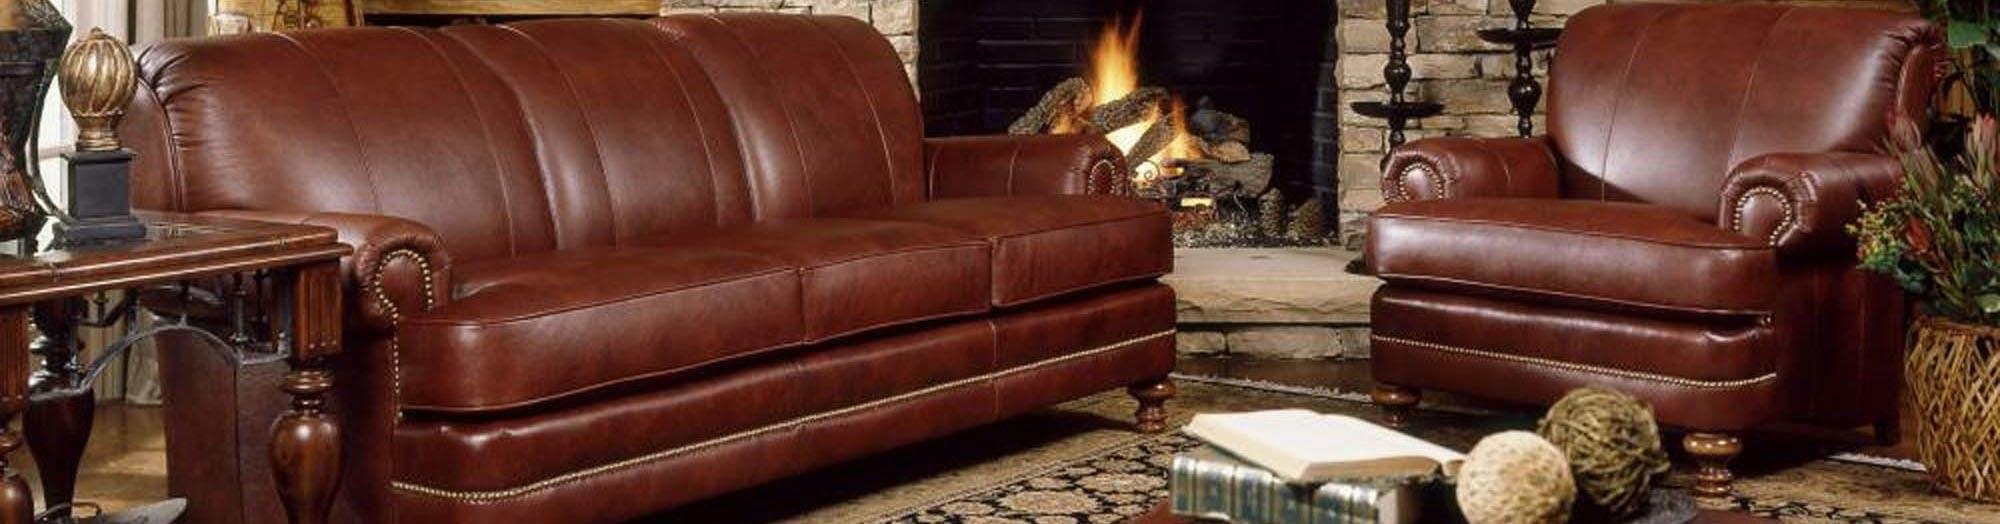 living room sets shop for sofas in cincinnati and dayton oh